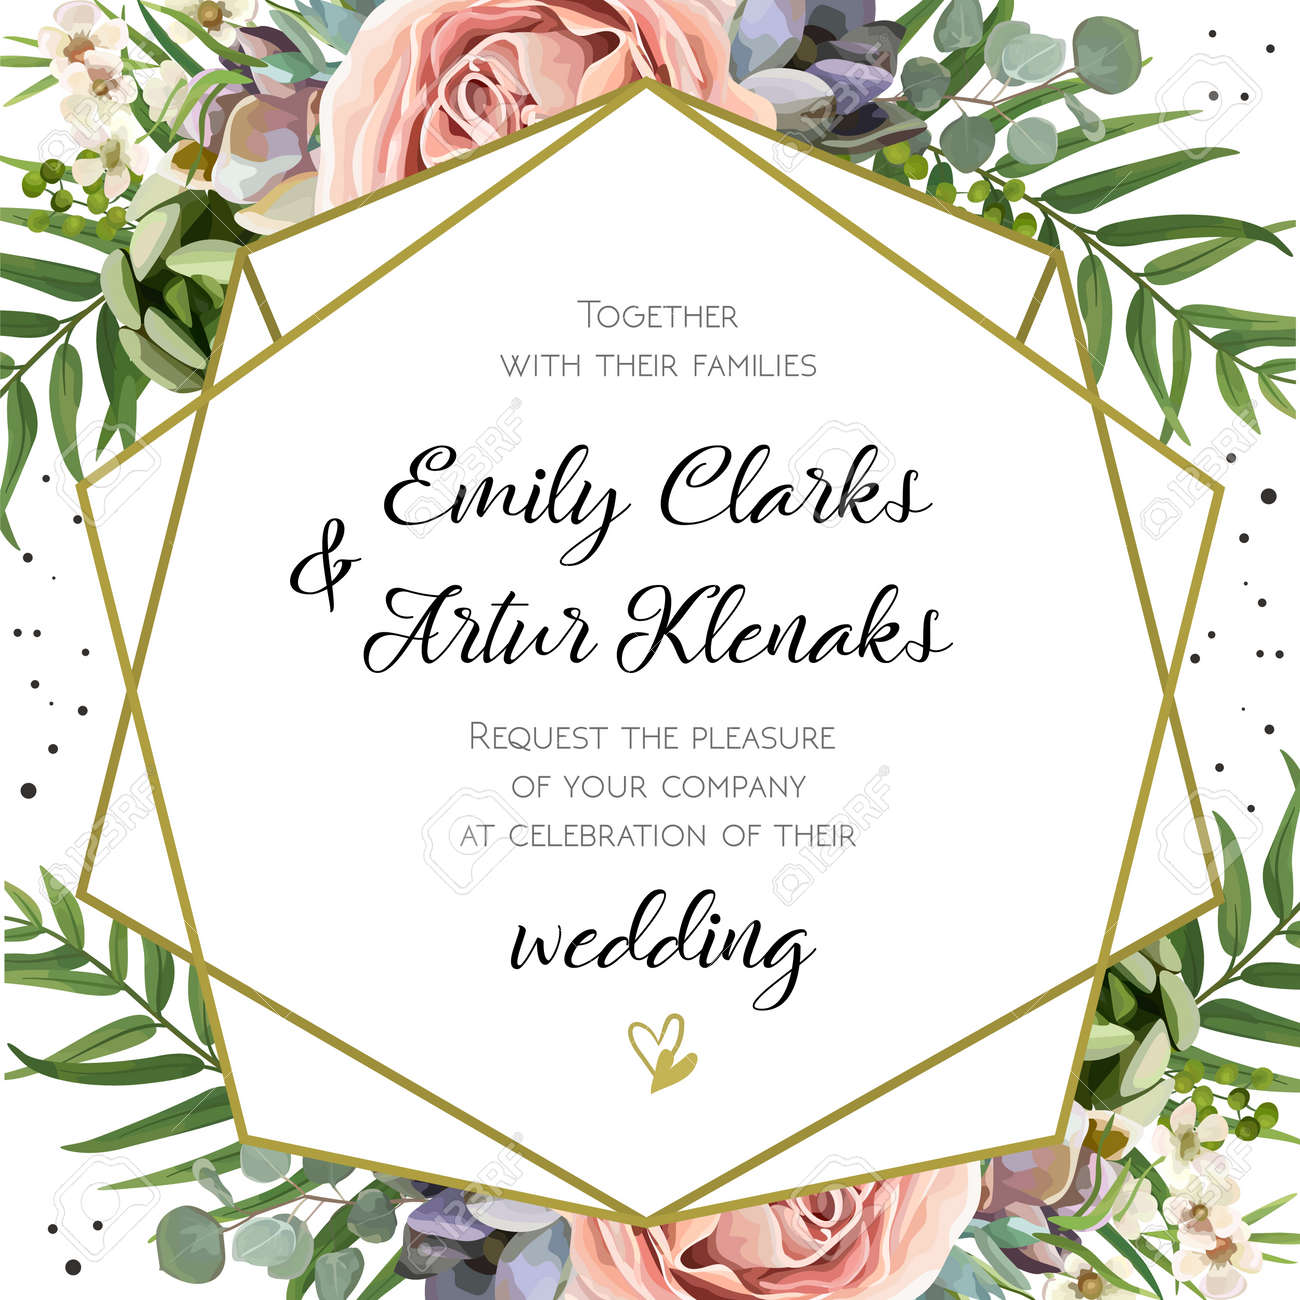 Wedding Invitation, floral invite card Design: Peach lavender pink garden Rose, succulent, wax, eucalyptus, green palm leaves, forest fern greenery geometric golden frame print. Vector cute copy space - 92759055